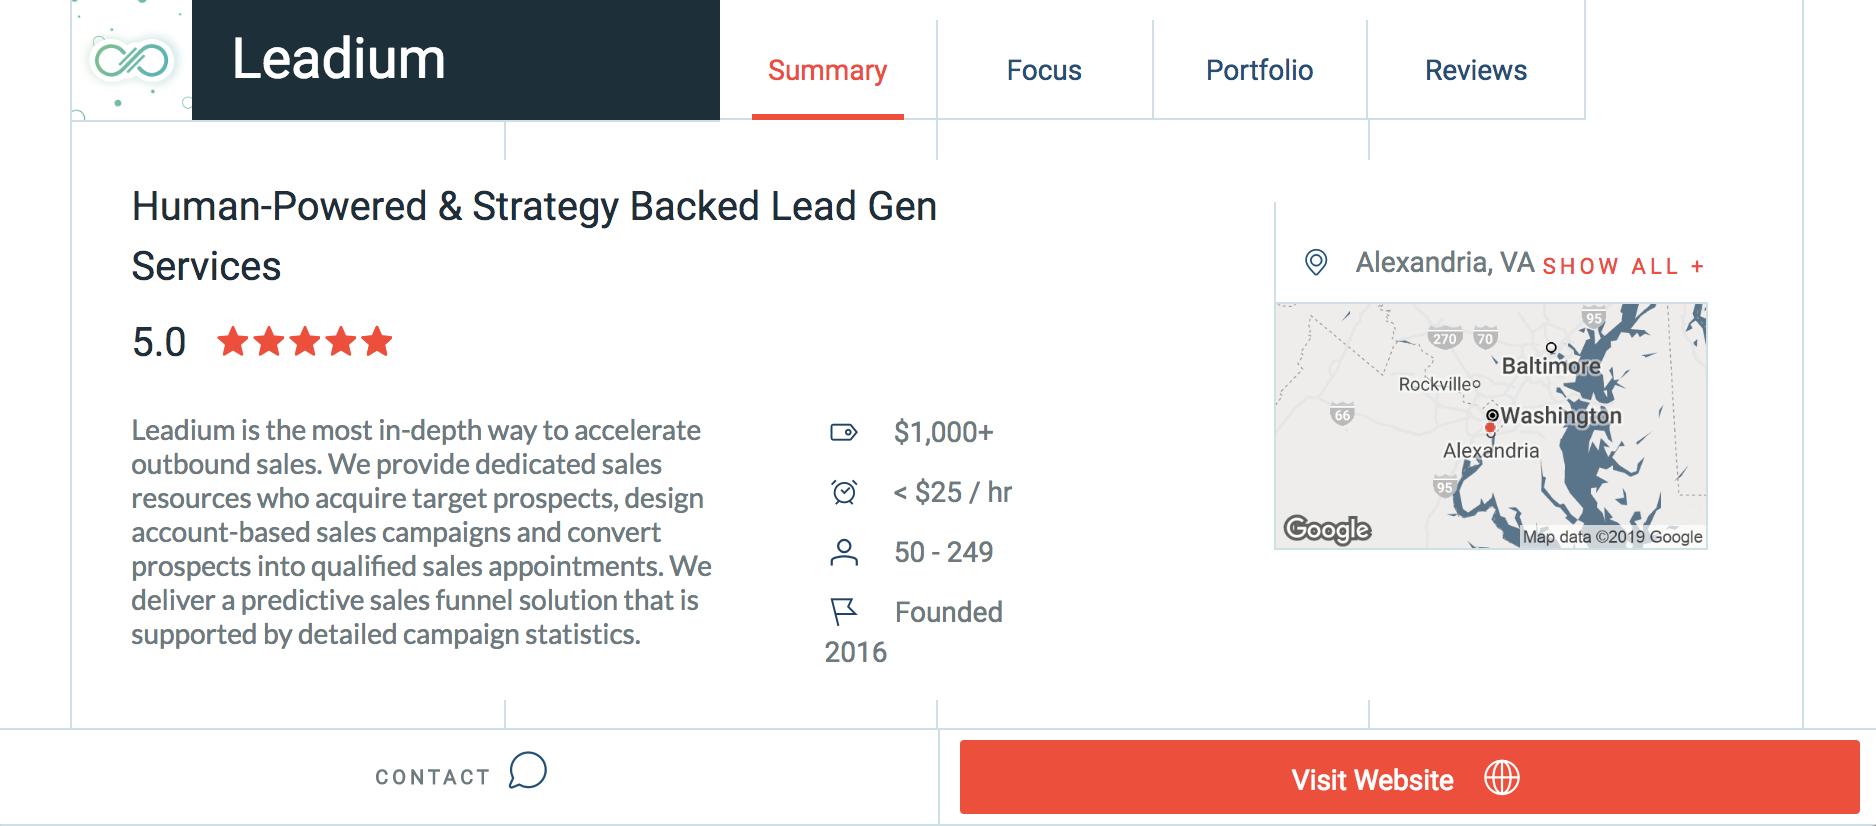 Leadium Named Premier Lead Generation Agency - Clutch.co